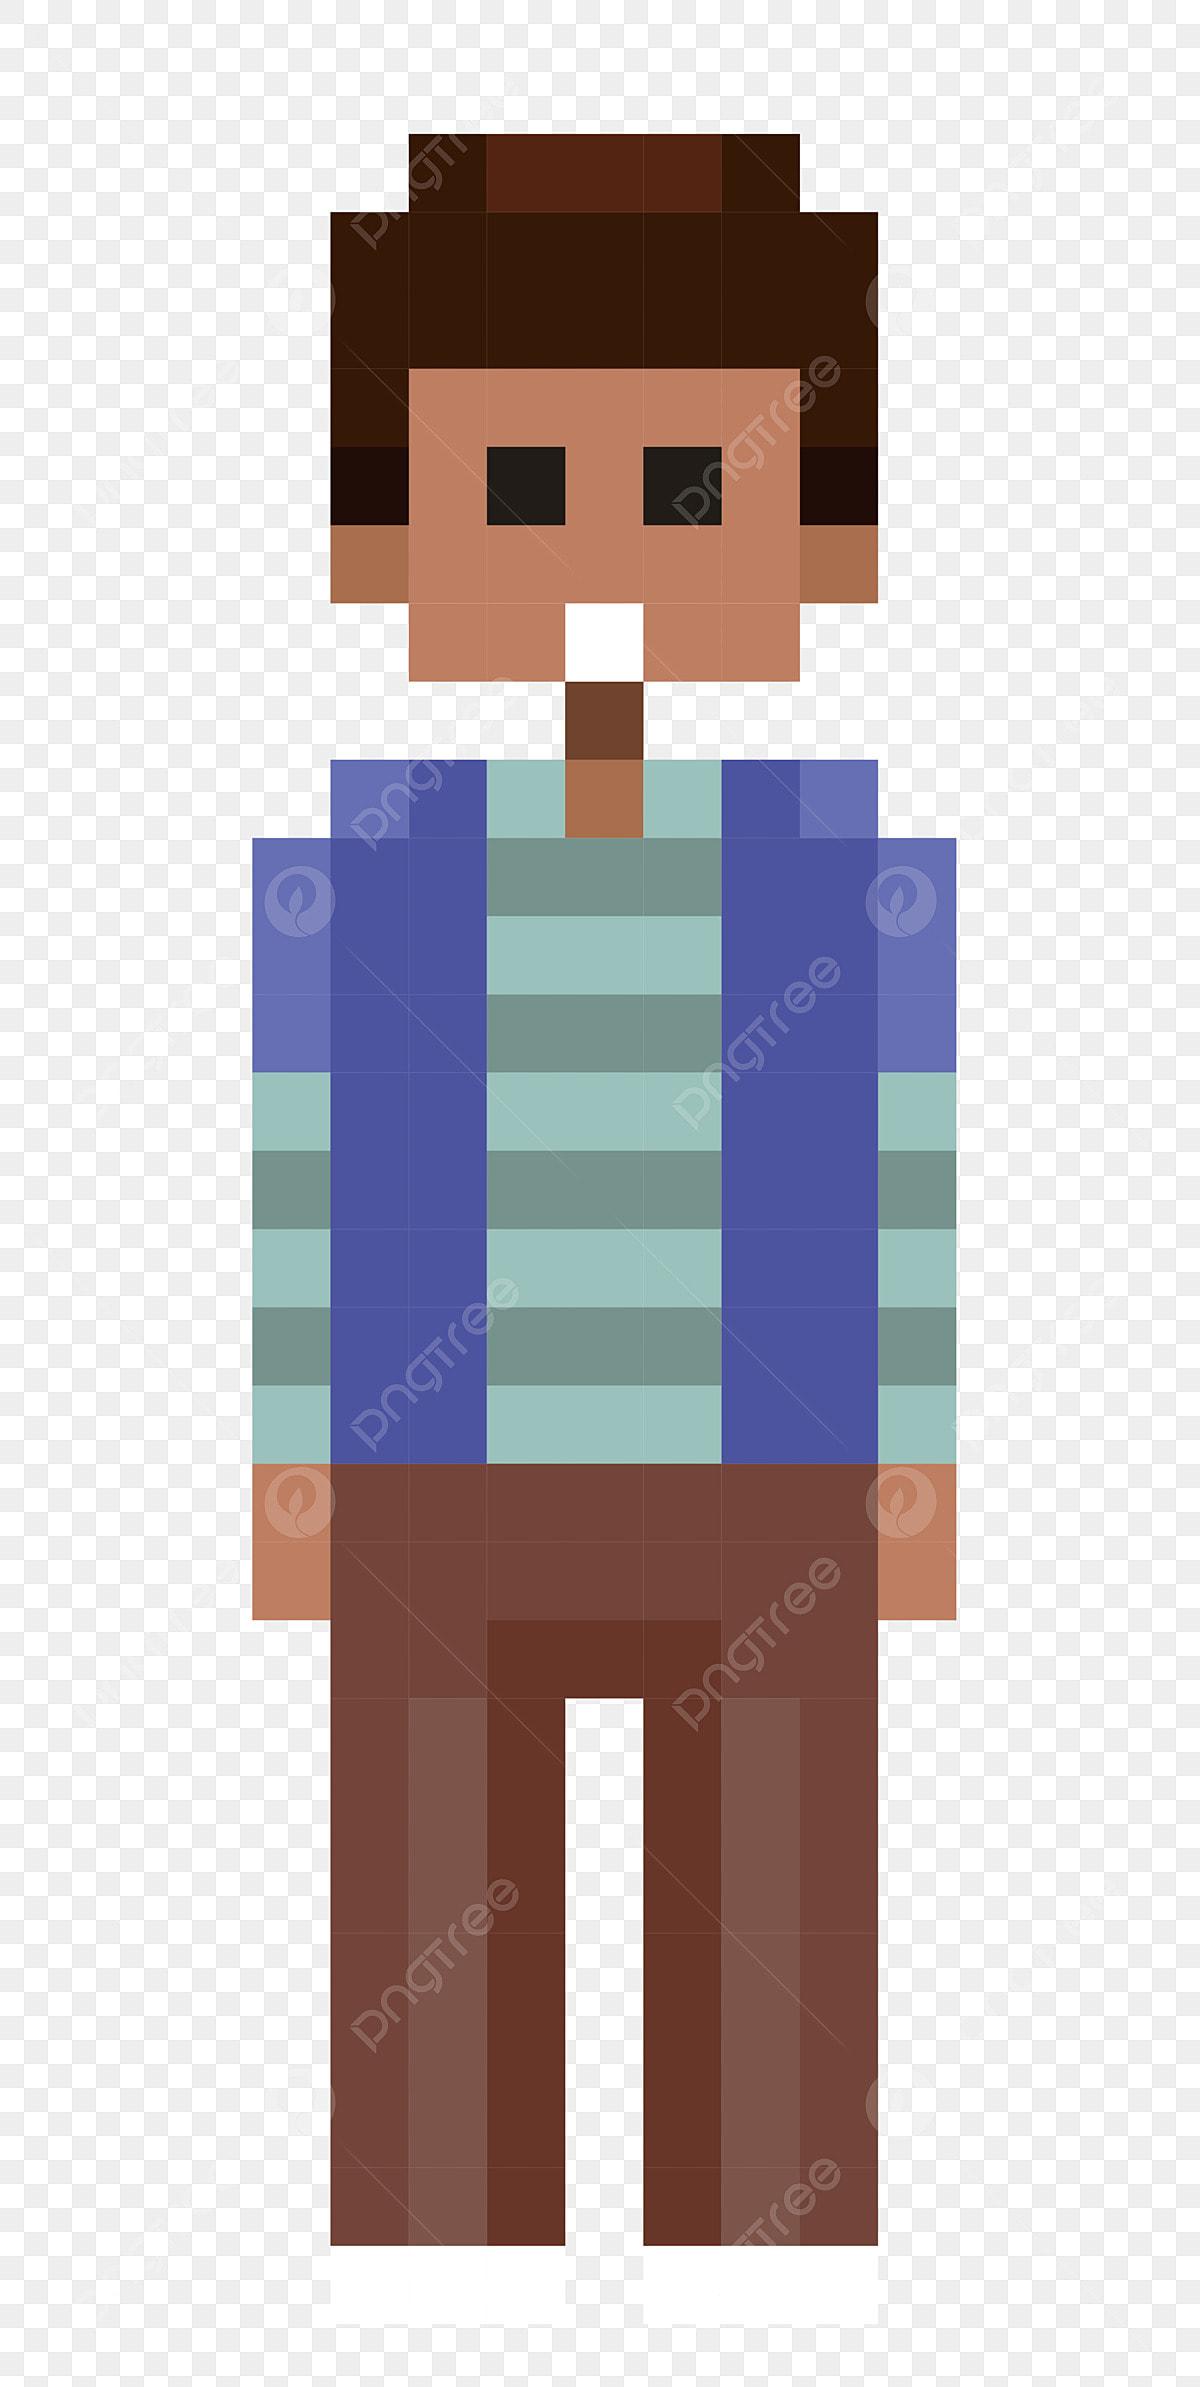 Pixel Boy Beau Garçon Illustration De Dessin Animé